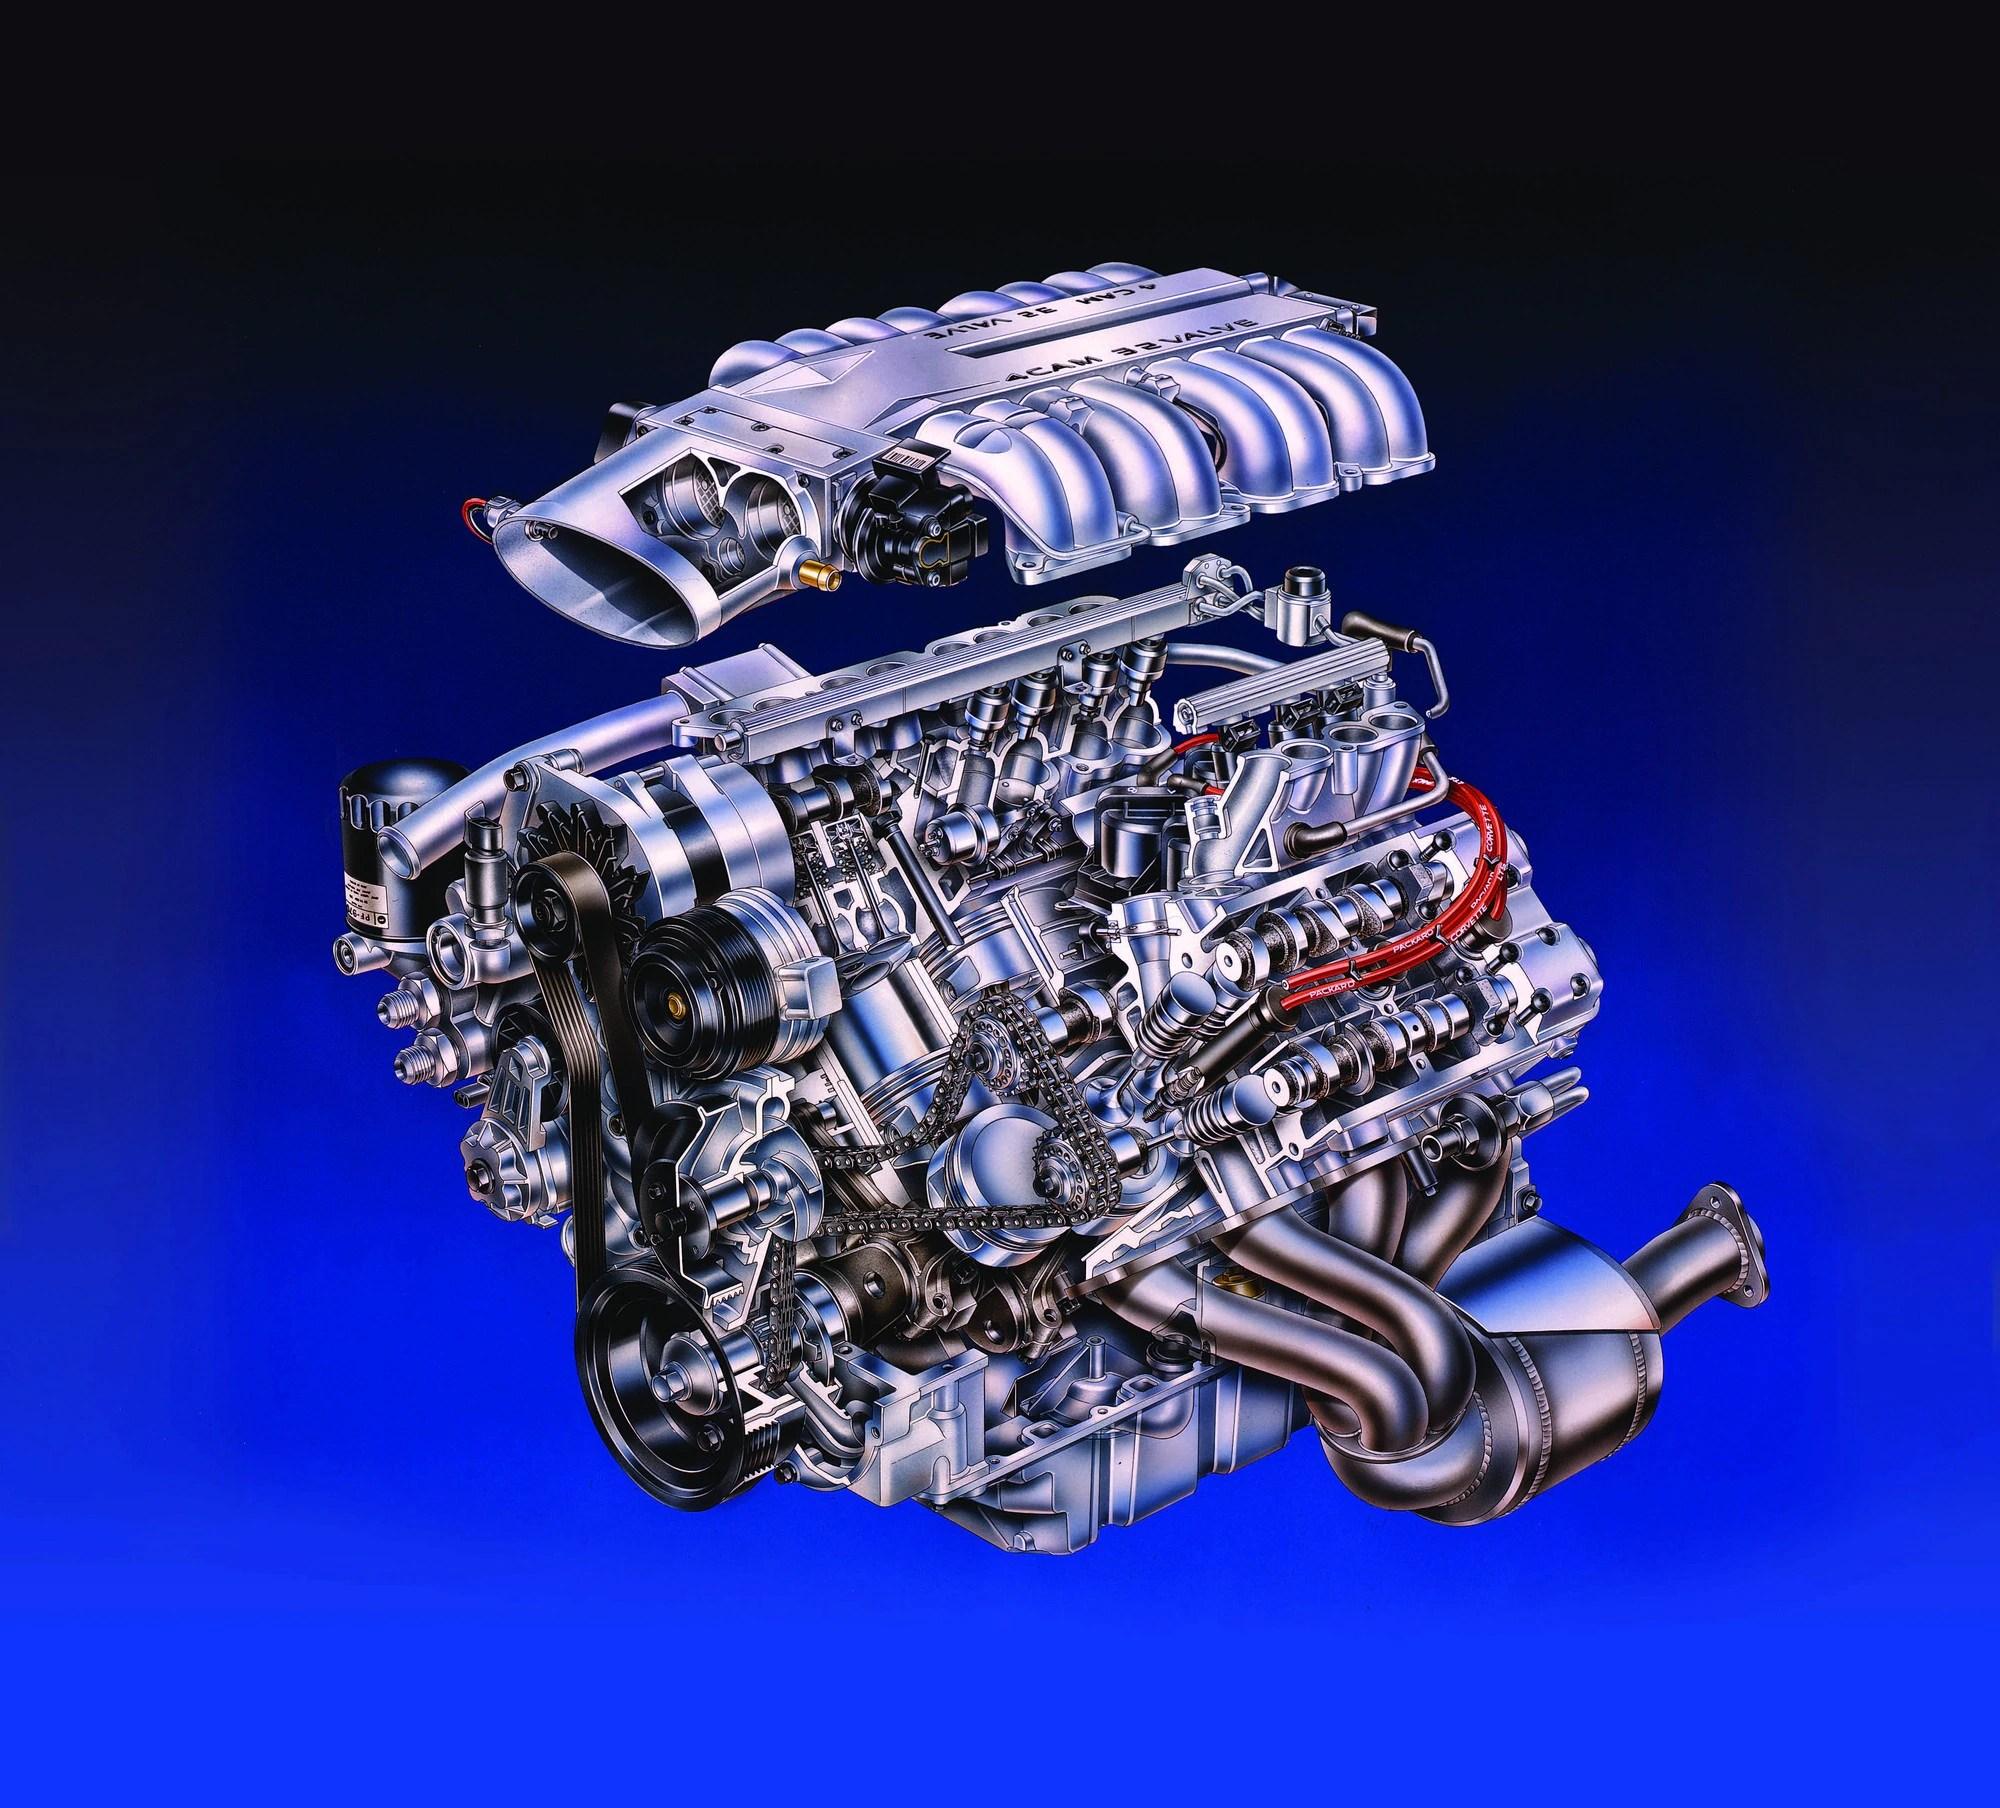 hight resolution of 1981 corvette engine diagram wiring library rh 2 embracingprevention org zr1 lt5 engine lt4 engine